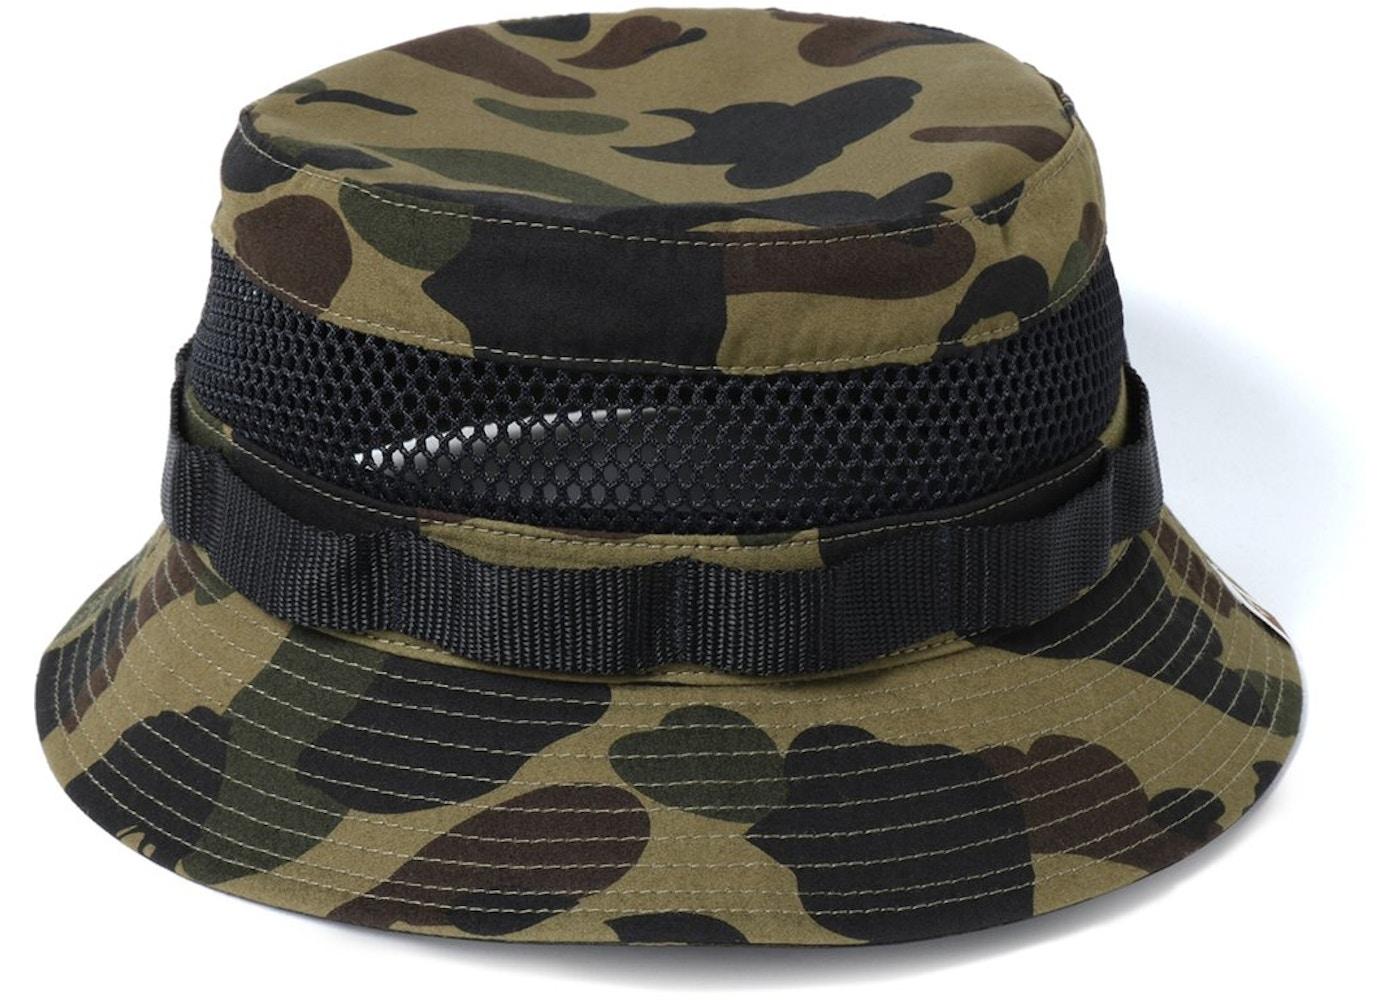 37f686c338d3 Buy   Sell Bape Streetwear